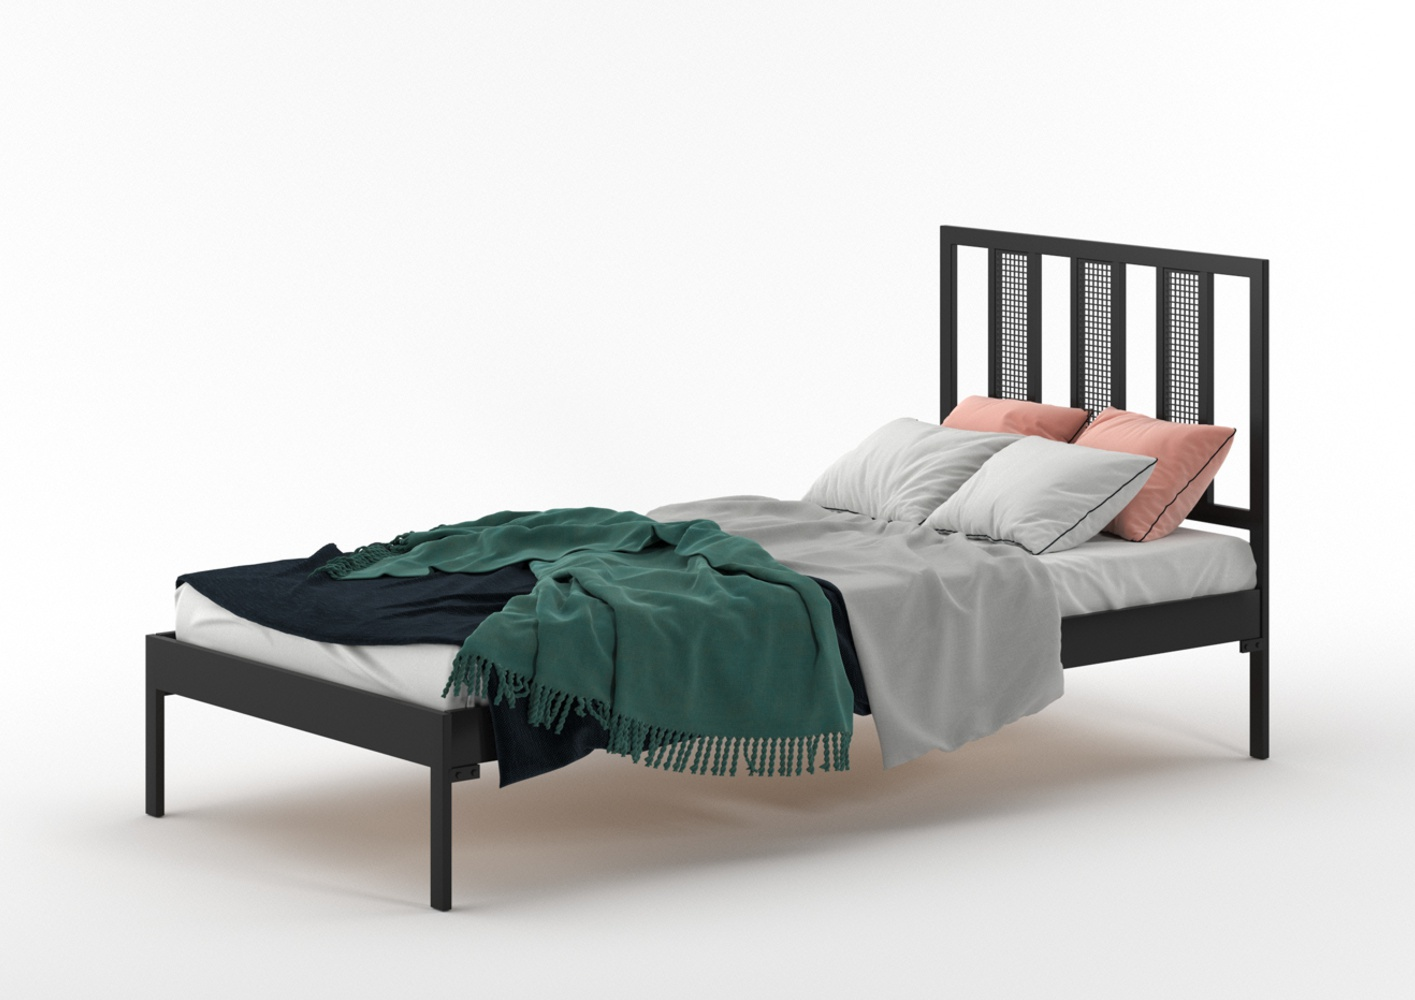 Łóżko metalowe Rio (wzór 16) (80-120 cm)